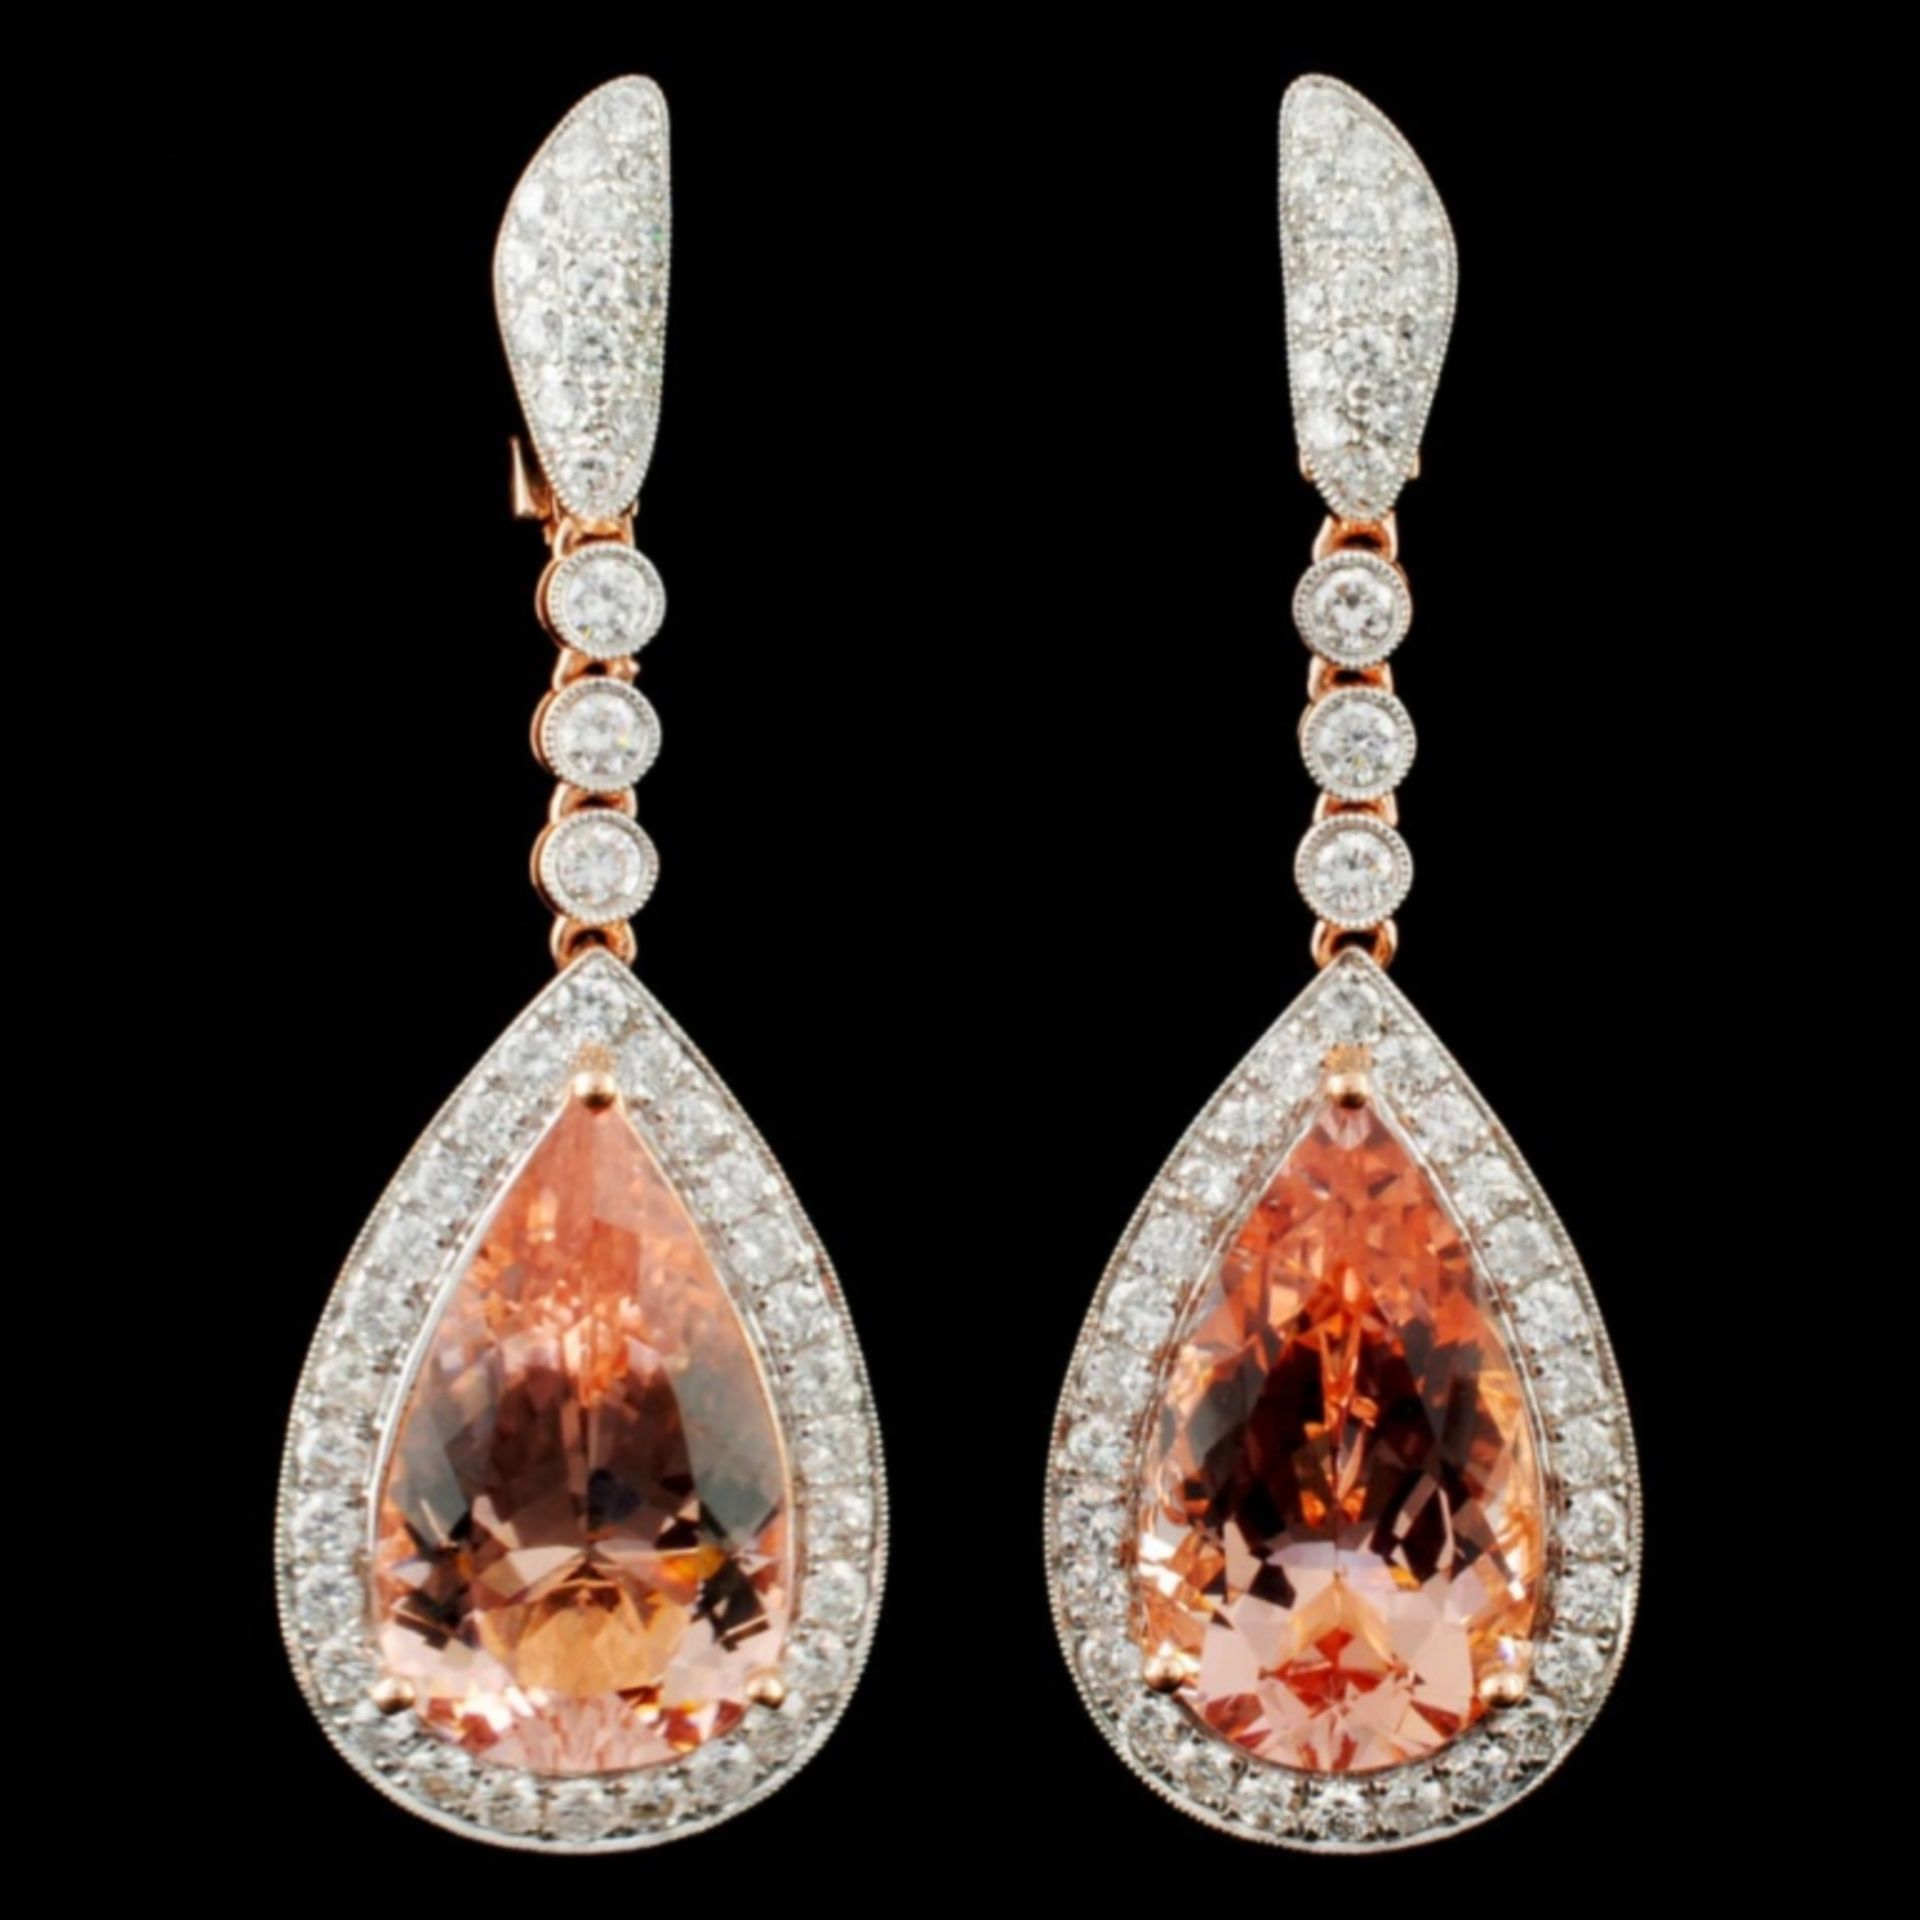 14K Gold 17.44ct Morganite & 2.61ctw Diamond Earri